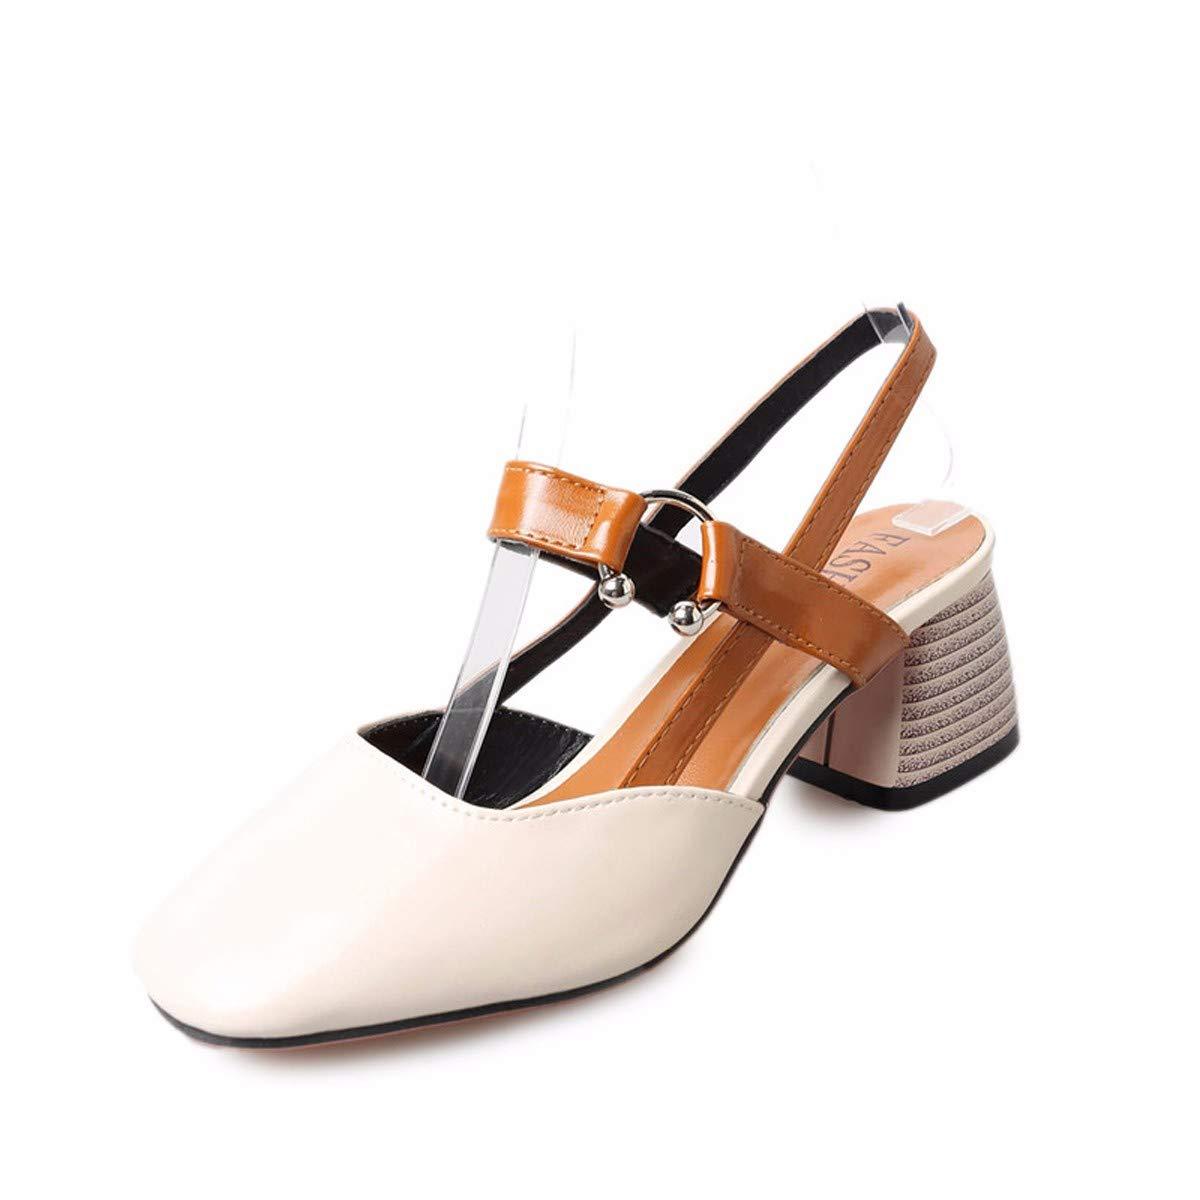 KPHY-Sommer Baotou Hart Bei Square Kopf Studierenden Jugend Mode Nahe Bei Wilden Schnalle Sandaleen 5Cm 36 Reis Weiß